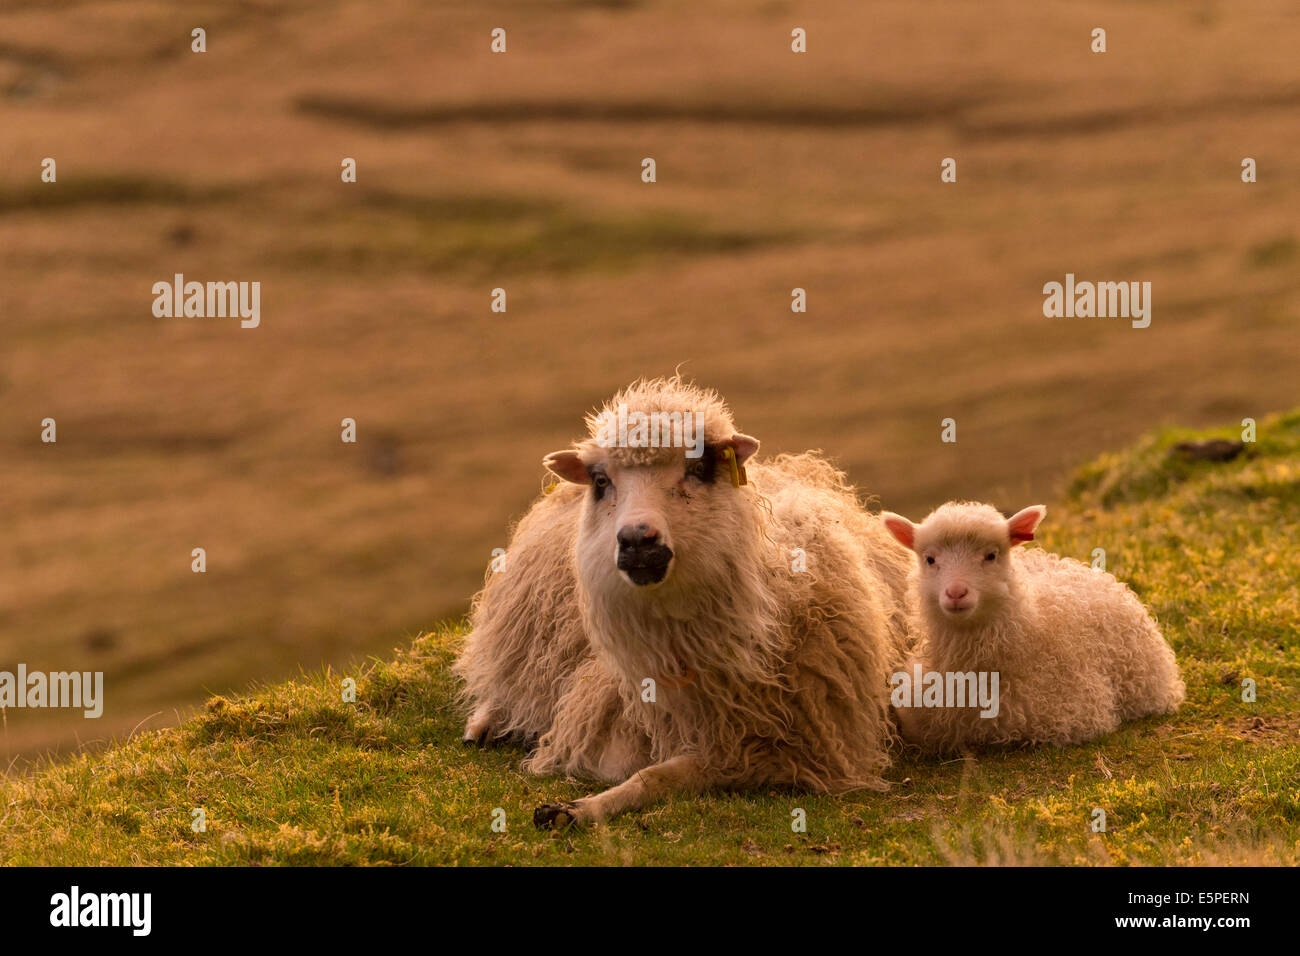 Ewe with lamb, lying down, evening mood, Faroe Islands, Denmark - Stock Image